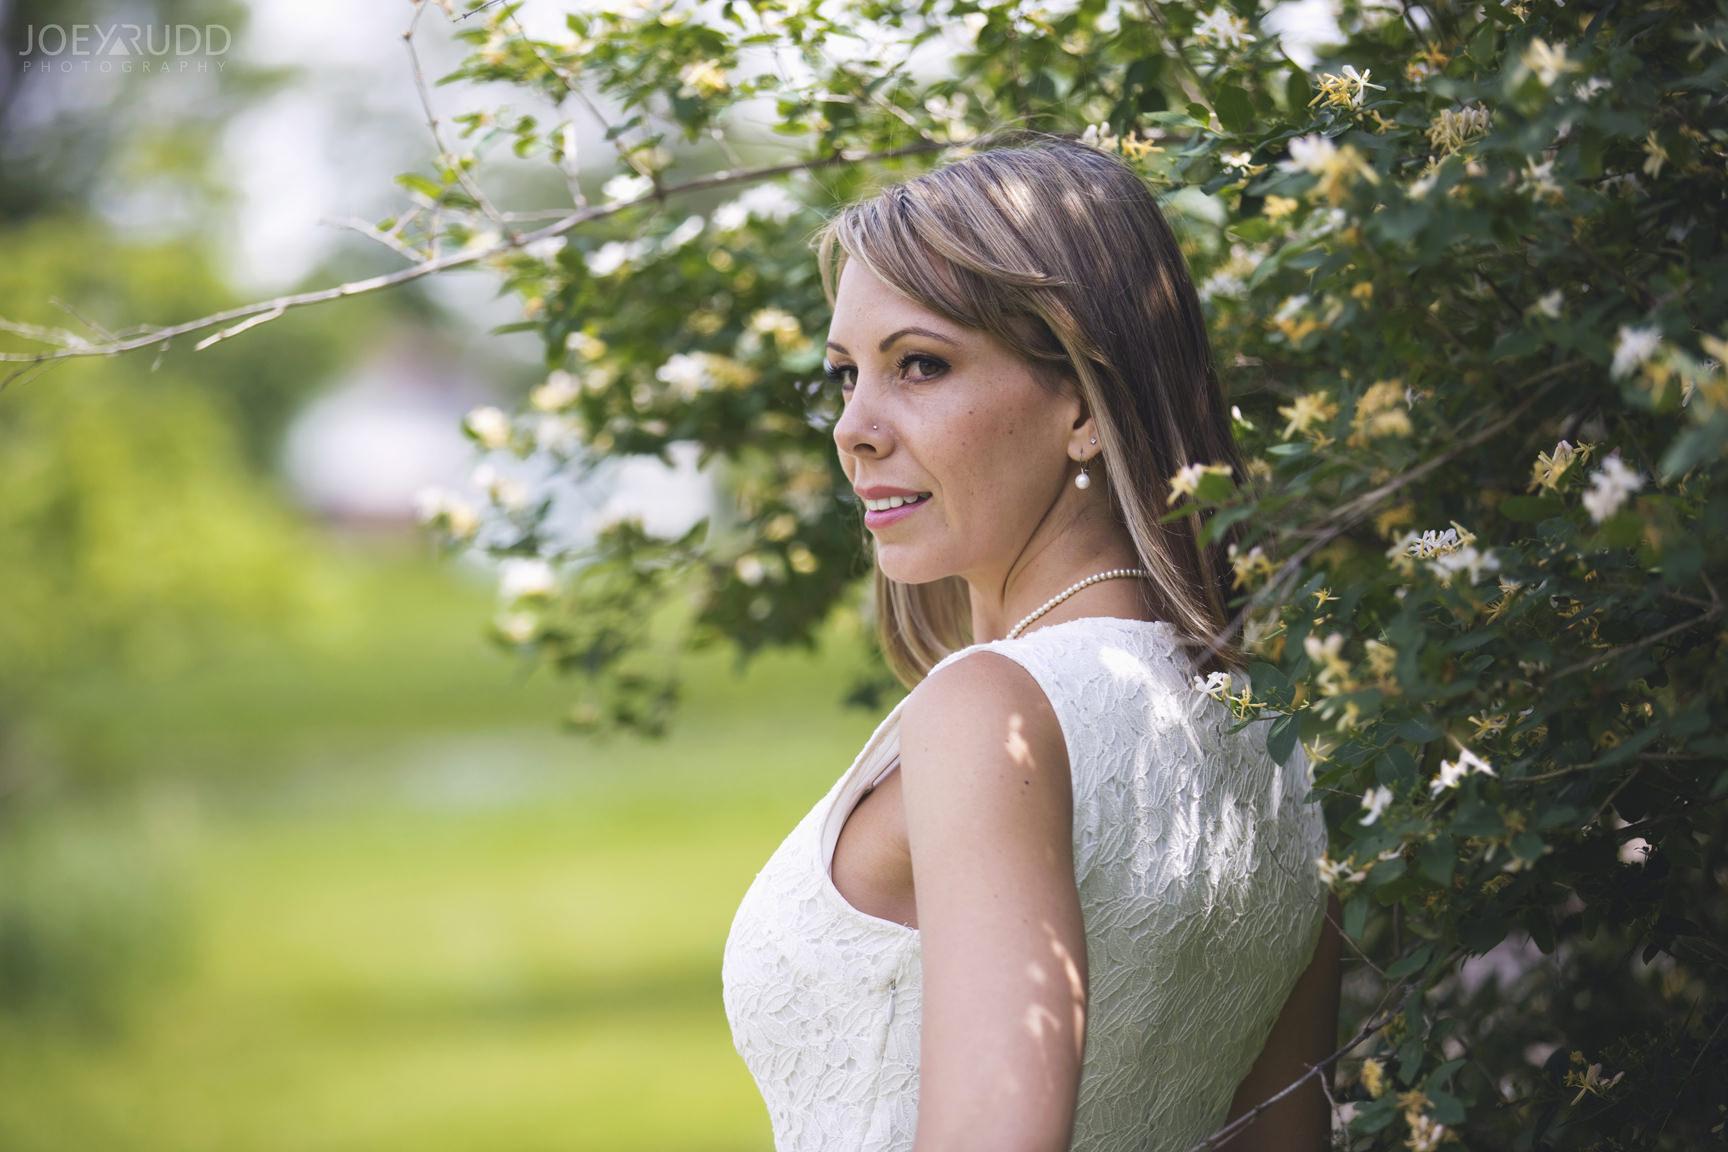 Elopement Wedding Ottawa Photographer Elope Photography Joey Rudd Photographer Bride